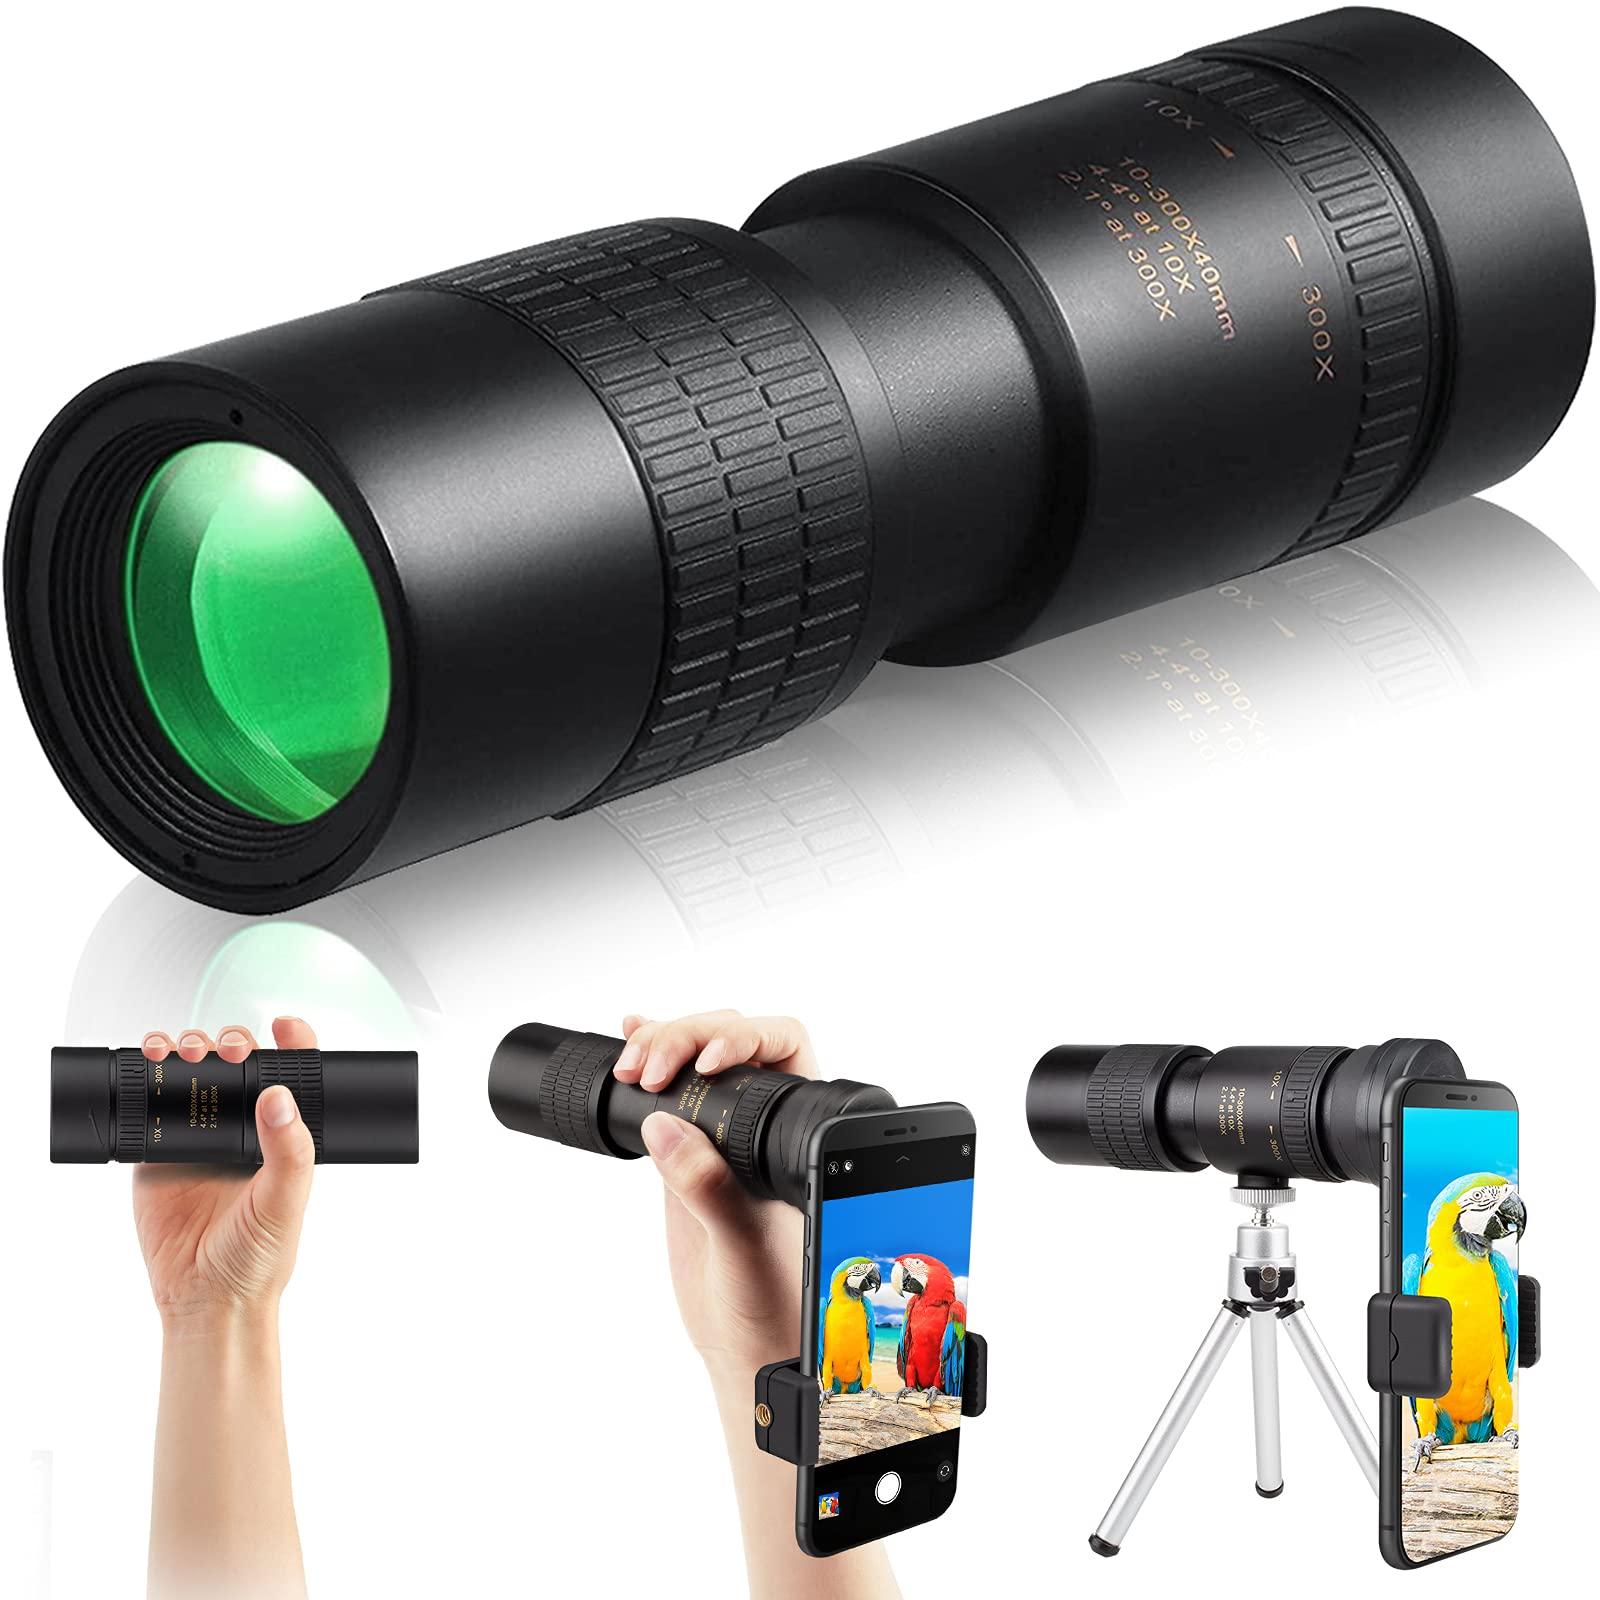 SFABF Monocular Telescope,4k 300x40 Monocular with Smartphone Holder & Tripod Zoom Telescope Scope HD Monocular Scope for Bird Watch Hunt Wildlife